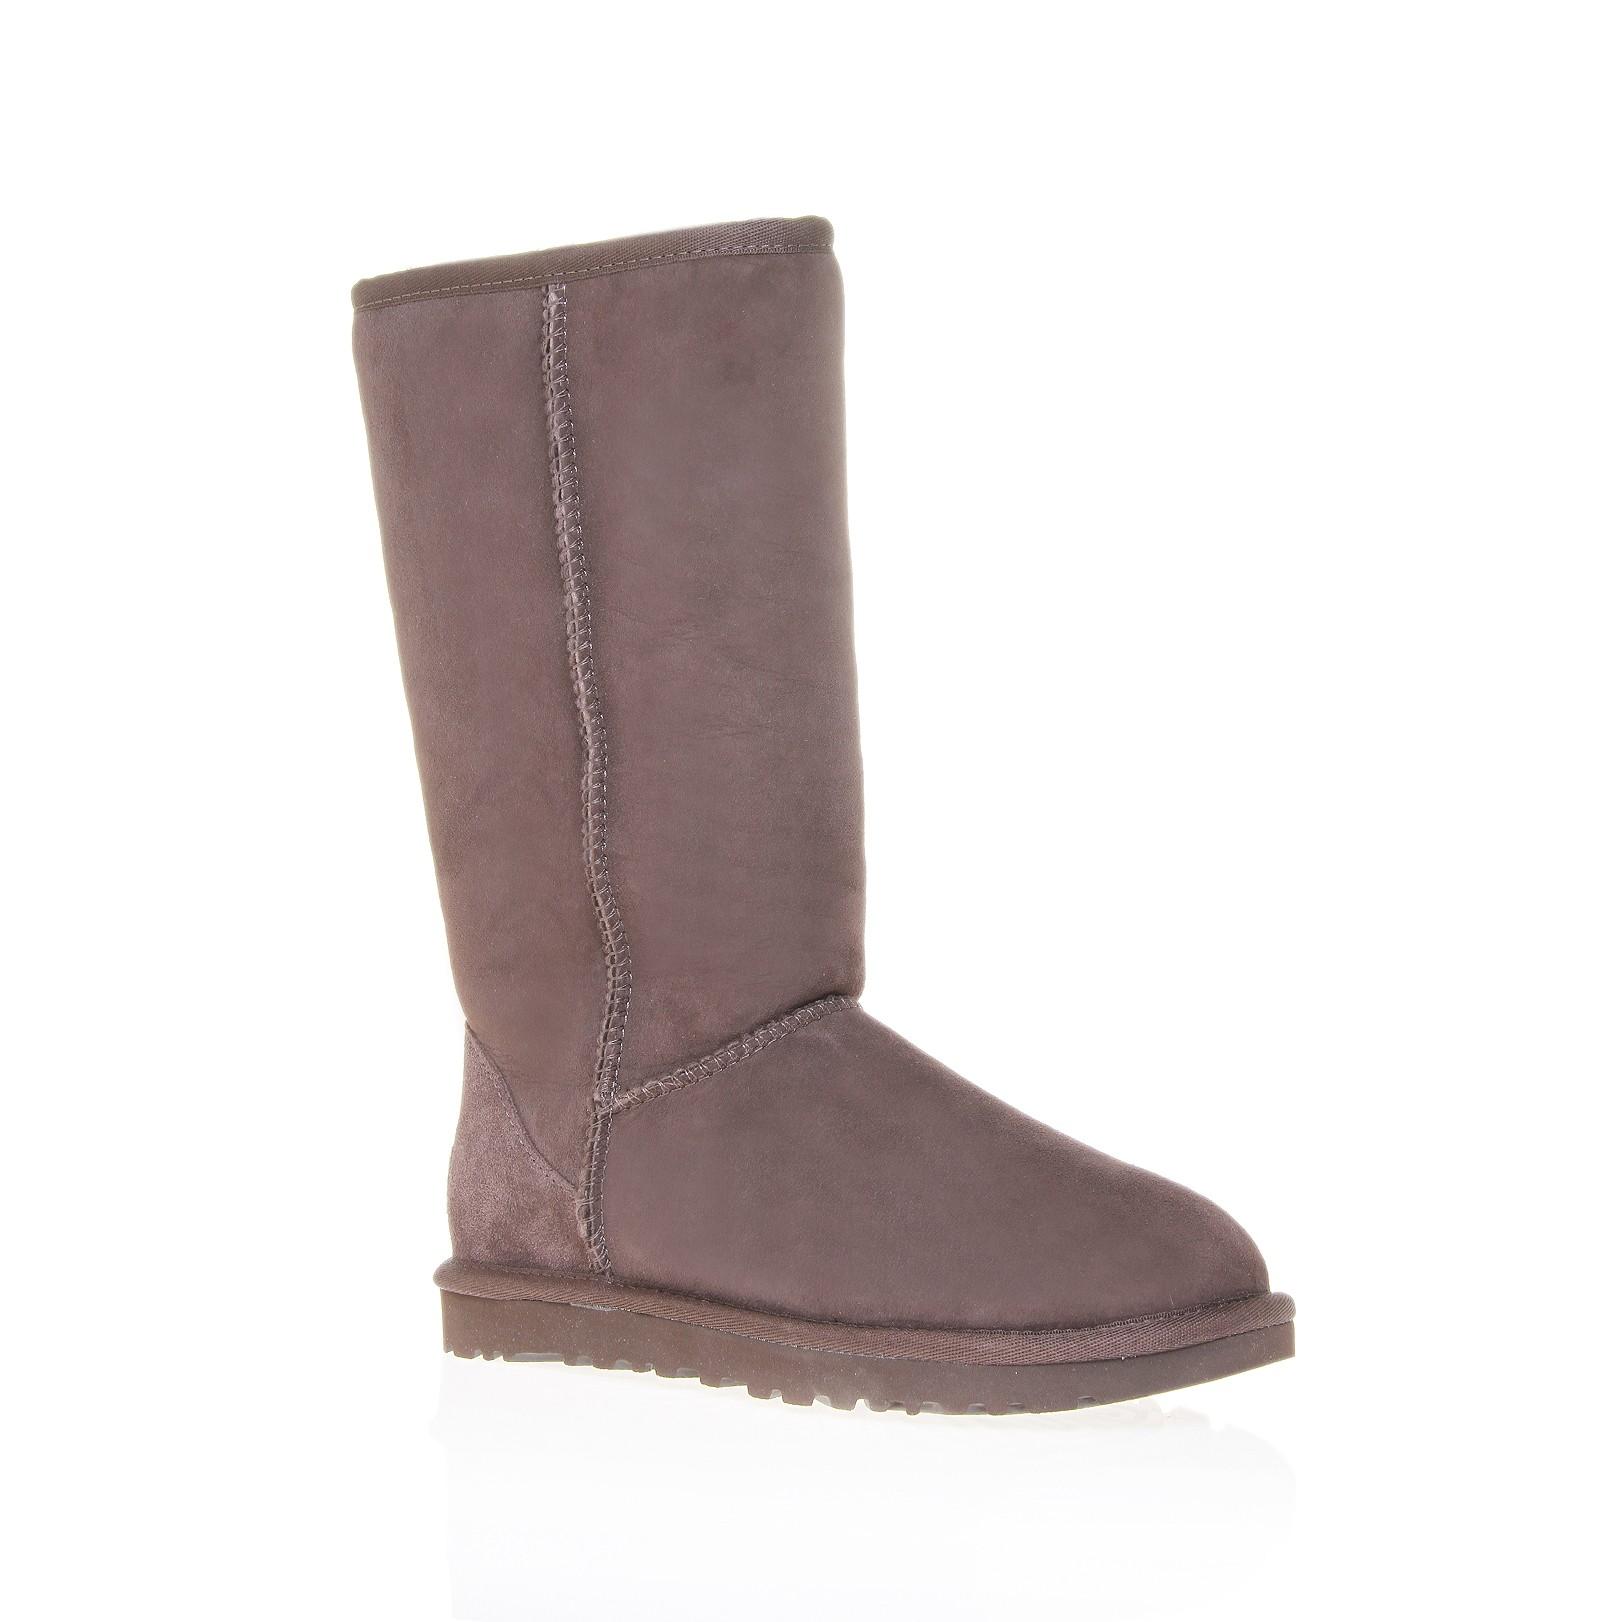 cheap sofas online australia ikea sectional sofa reviews kurt geiger | tall chocolate brown flat suede boots ...